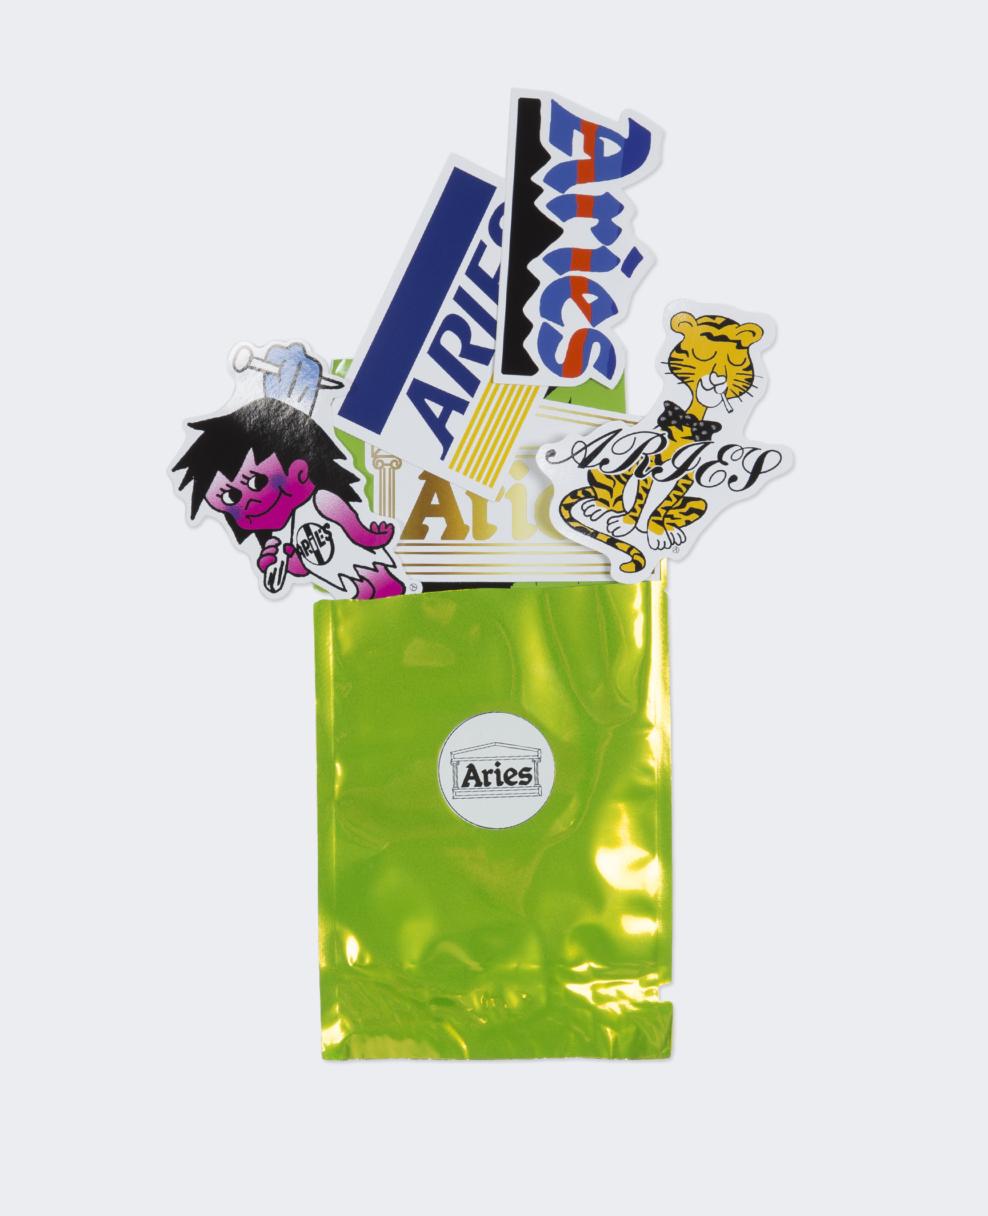 aries sticker pack.jpg